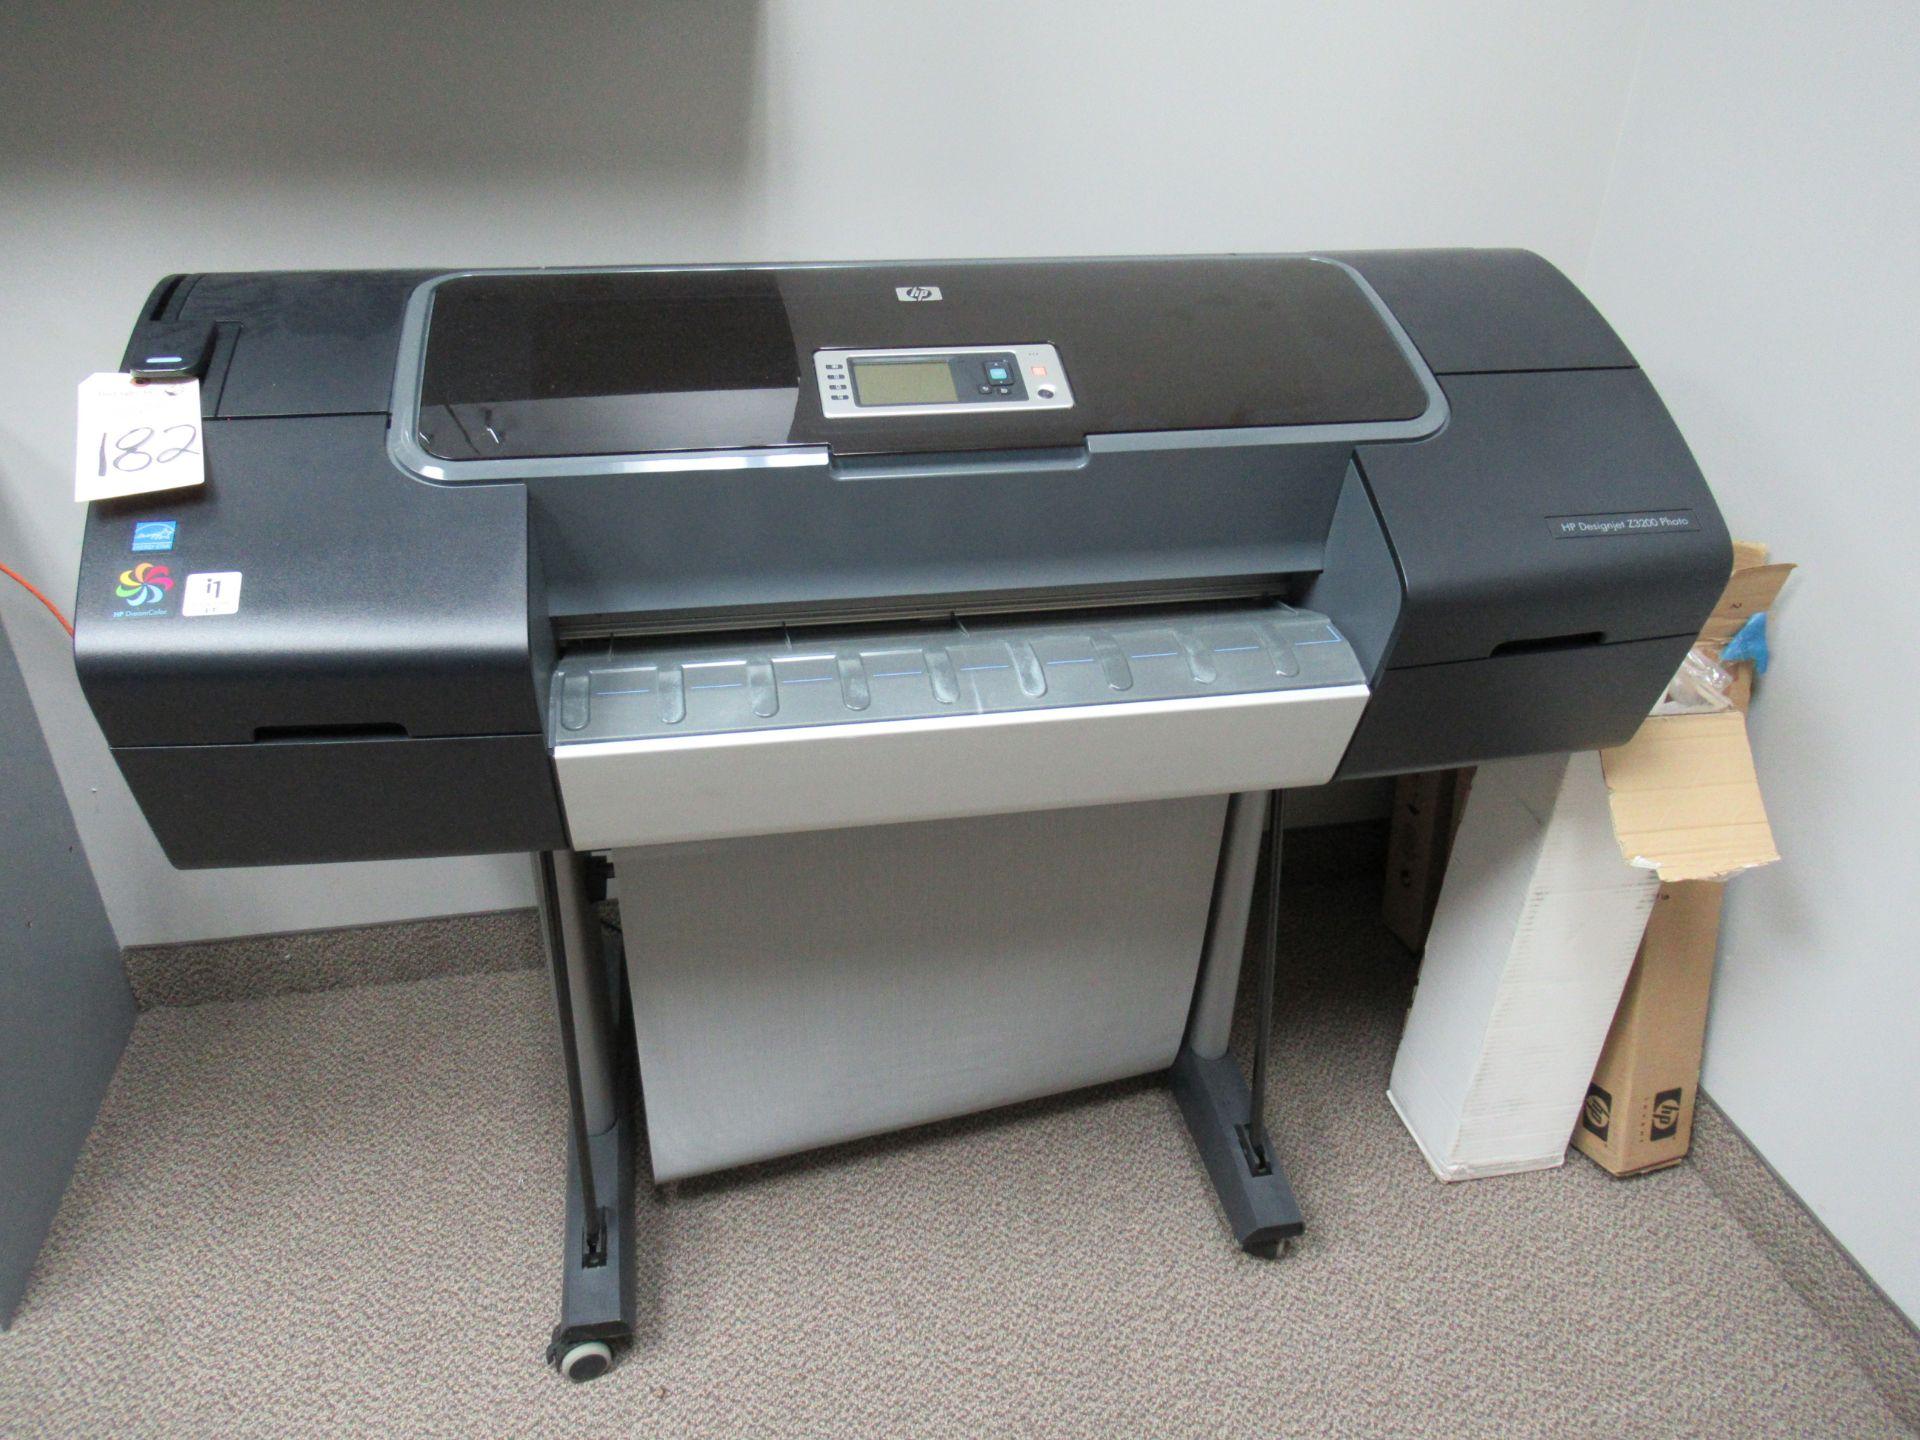 HP DesignJet Z3200 Photo Plot Printer with Plotting Paper